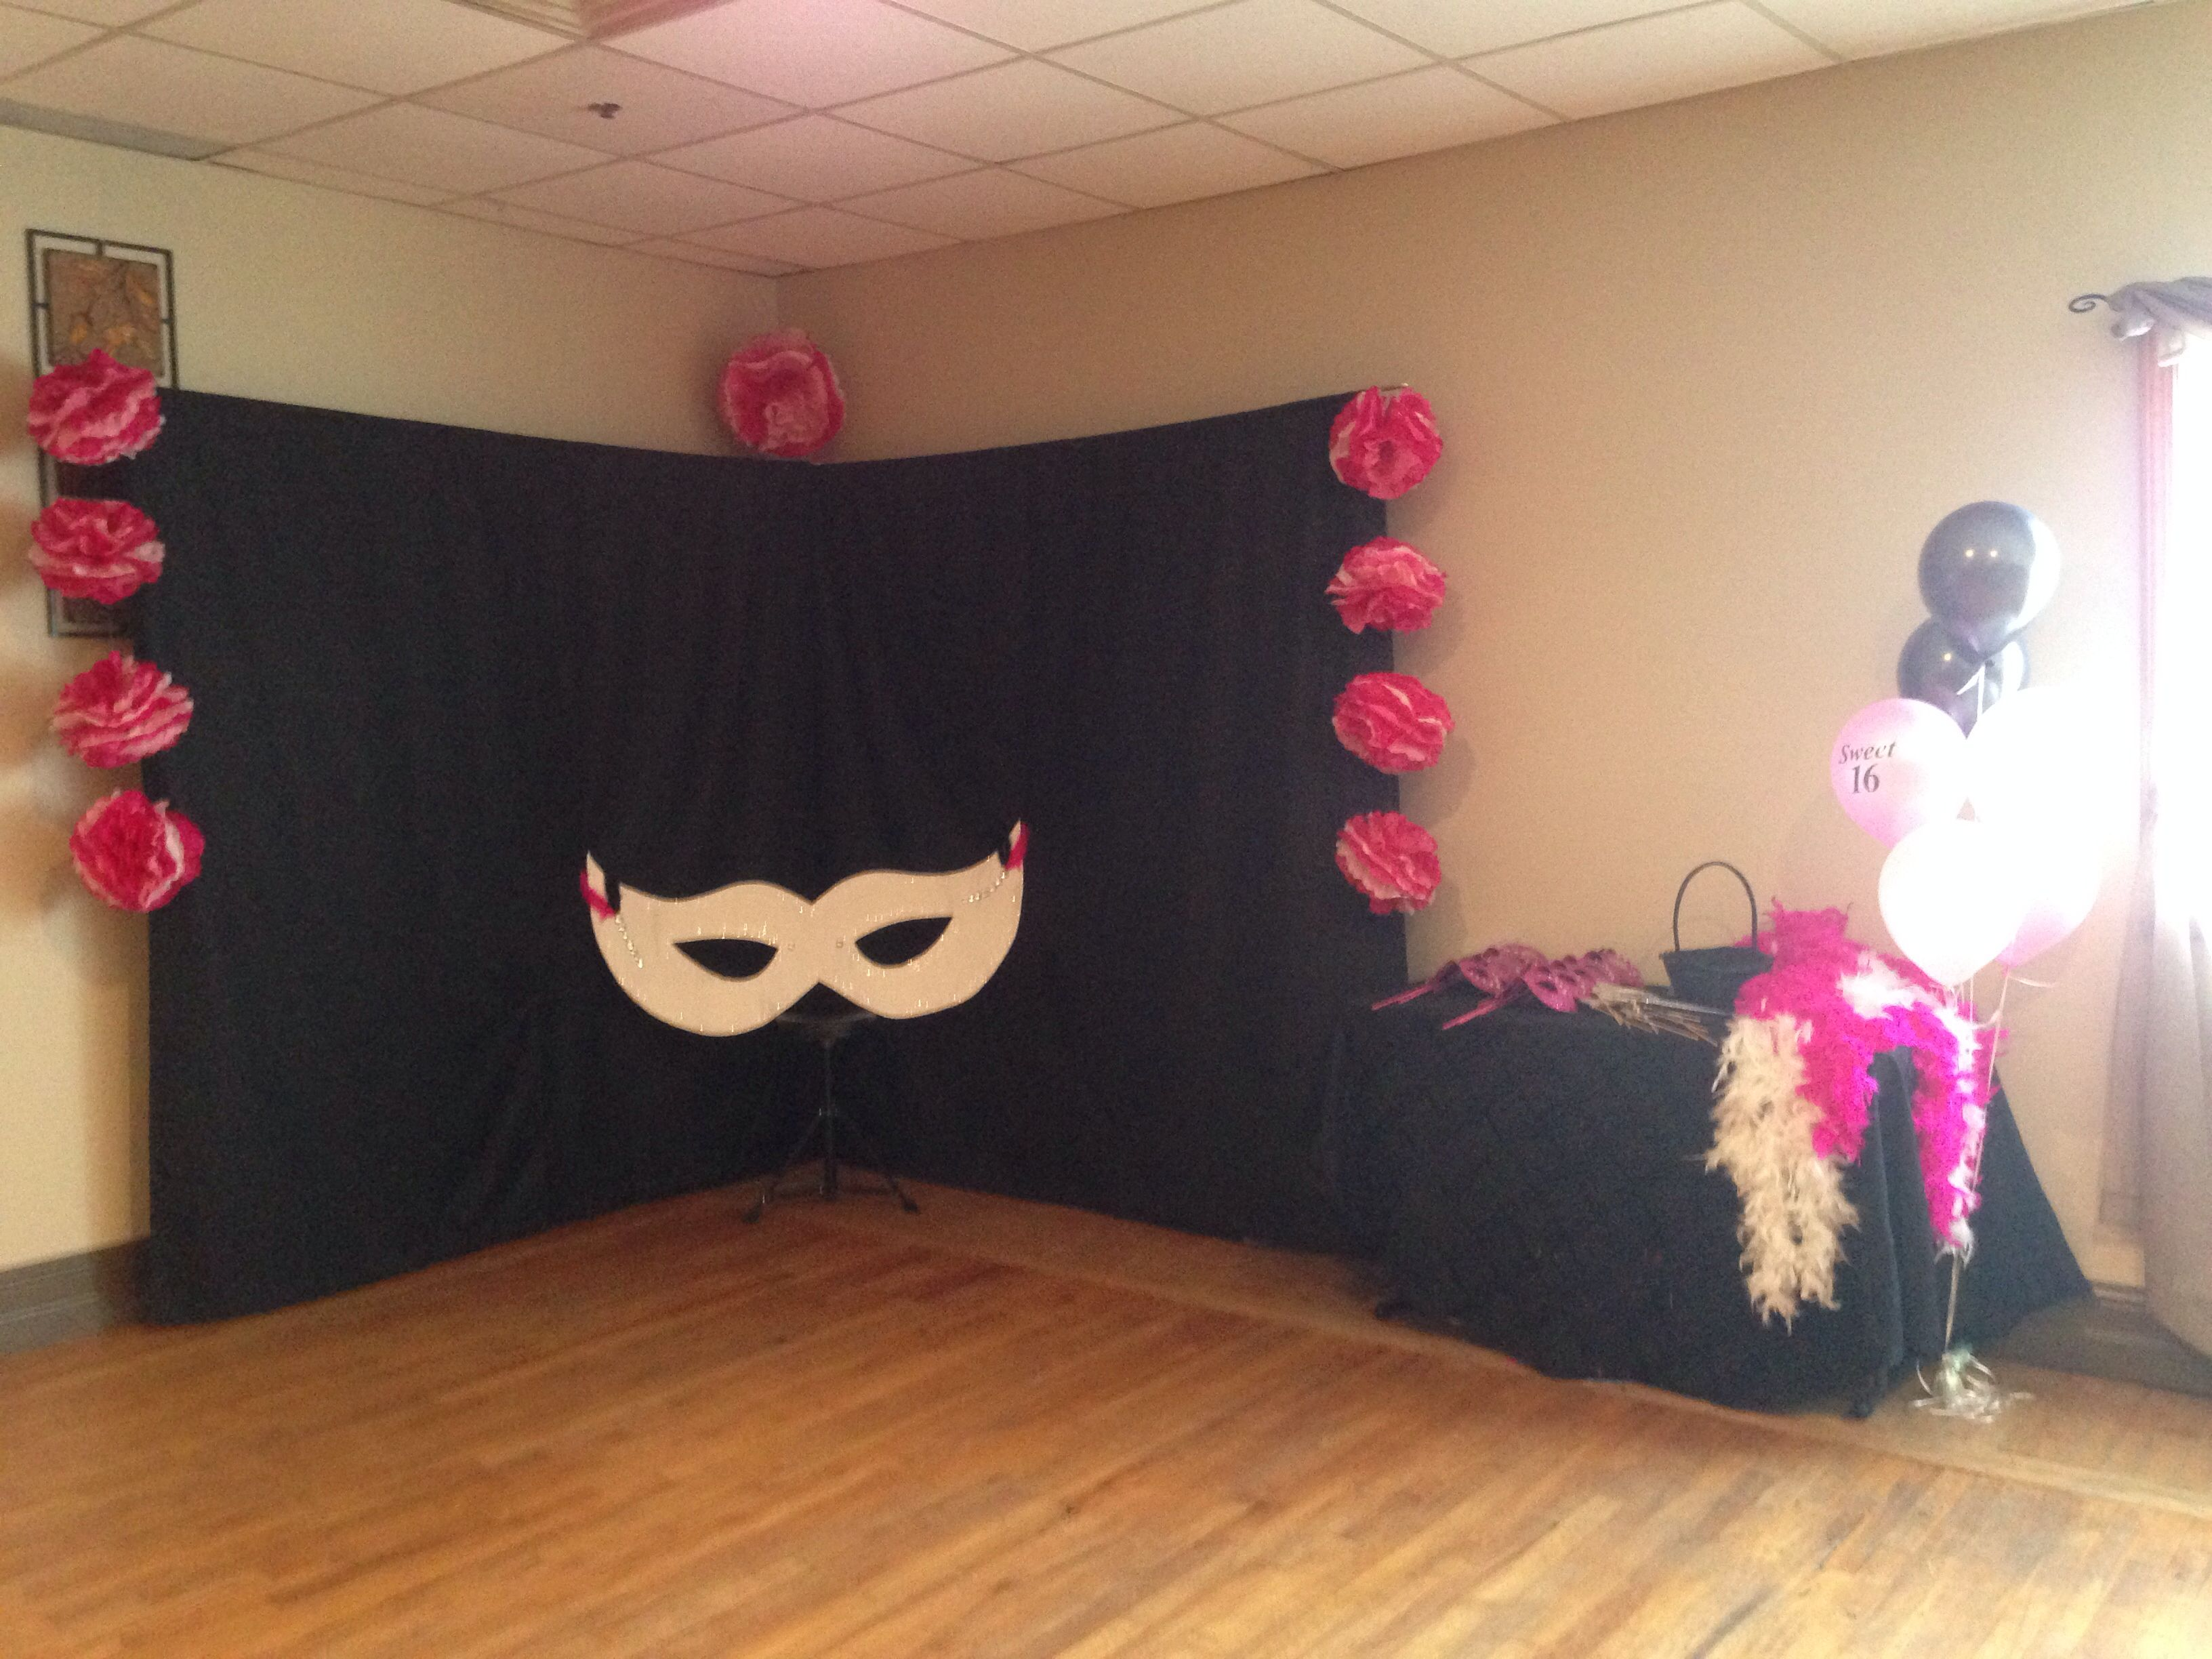 Masquerade Party Photo Booth Masquerade Party Decorations Masquerade Party Themes Masquerade Party Invitations